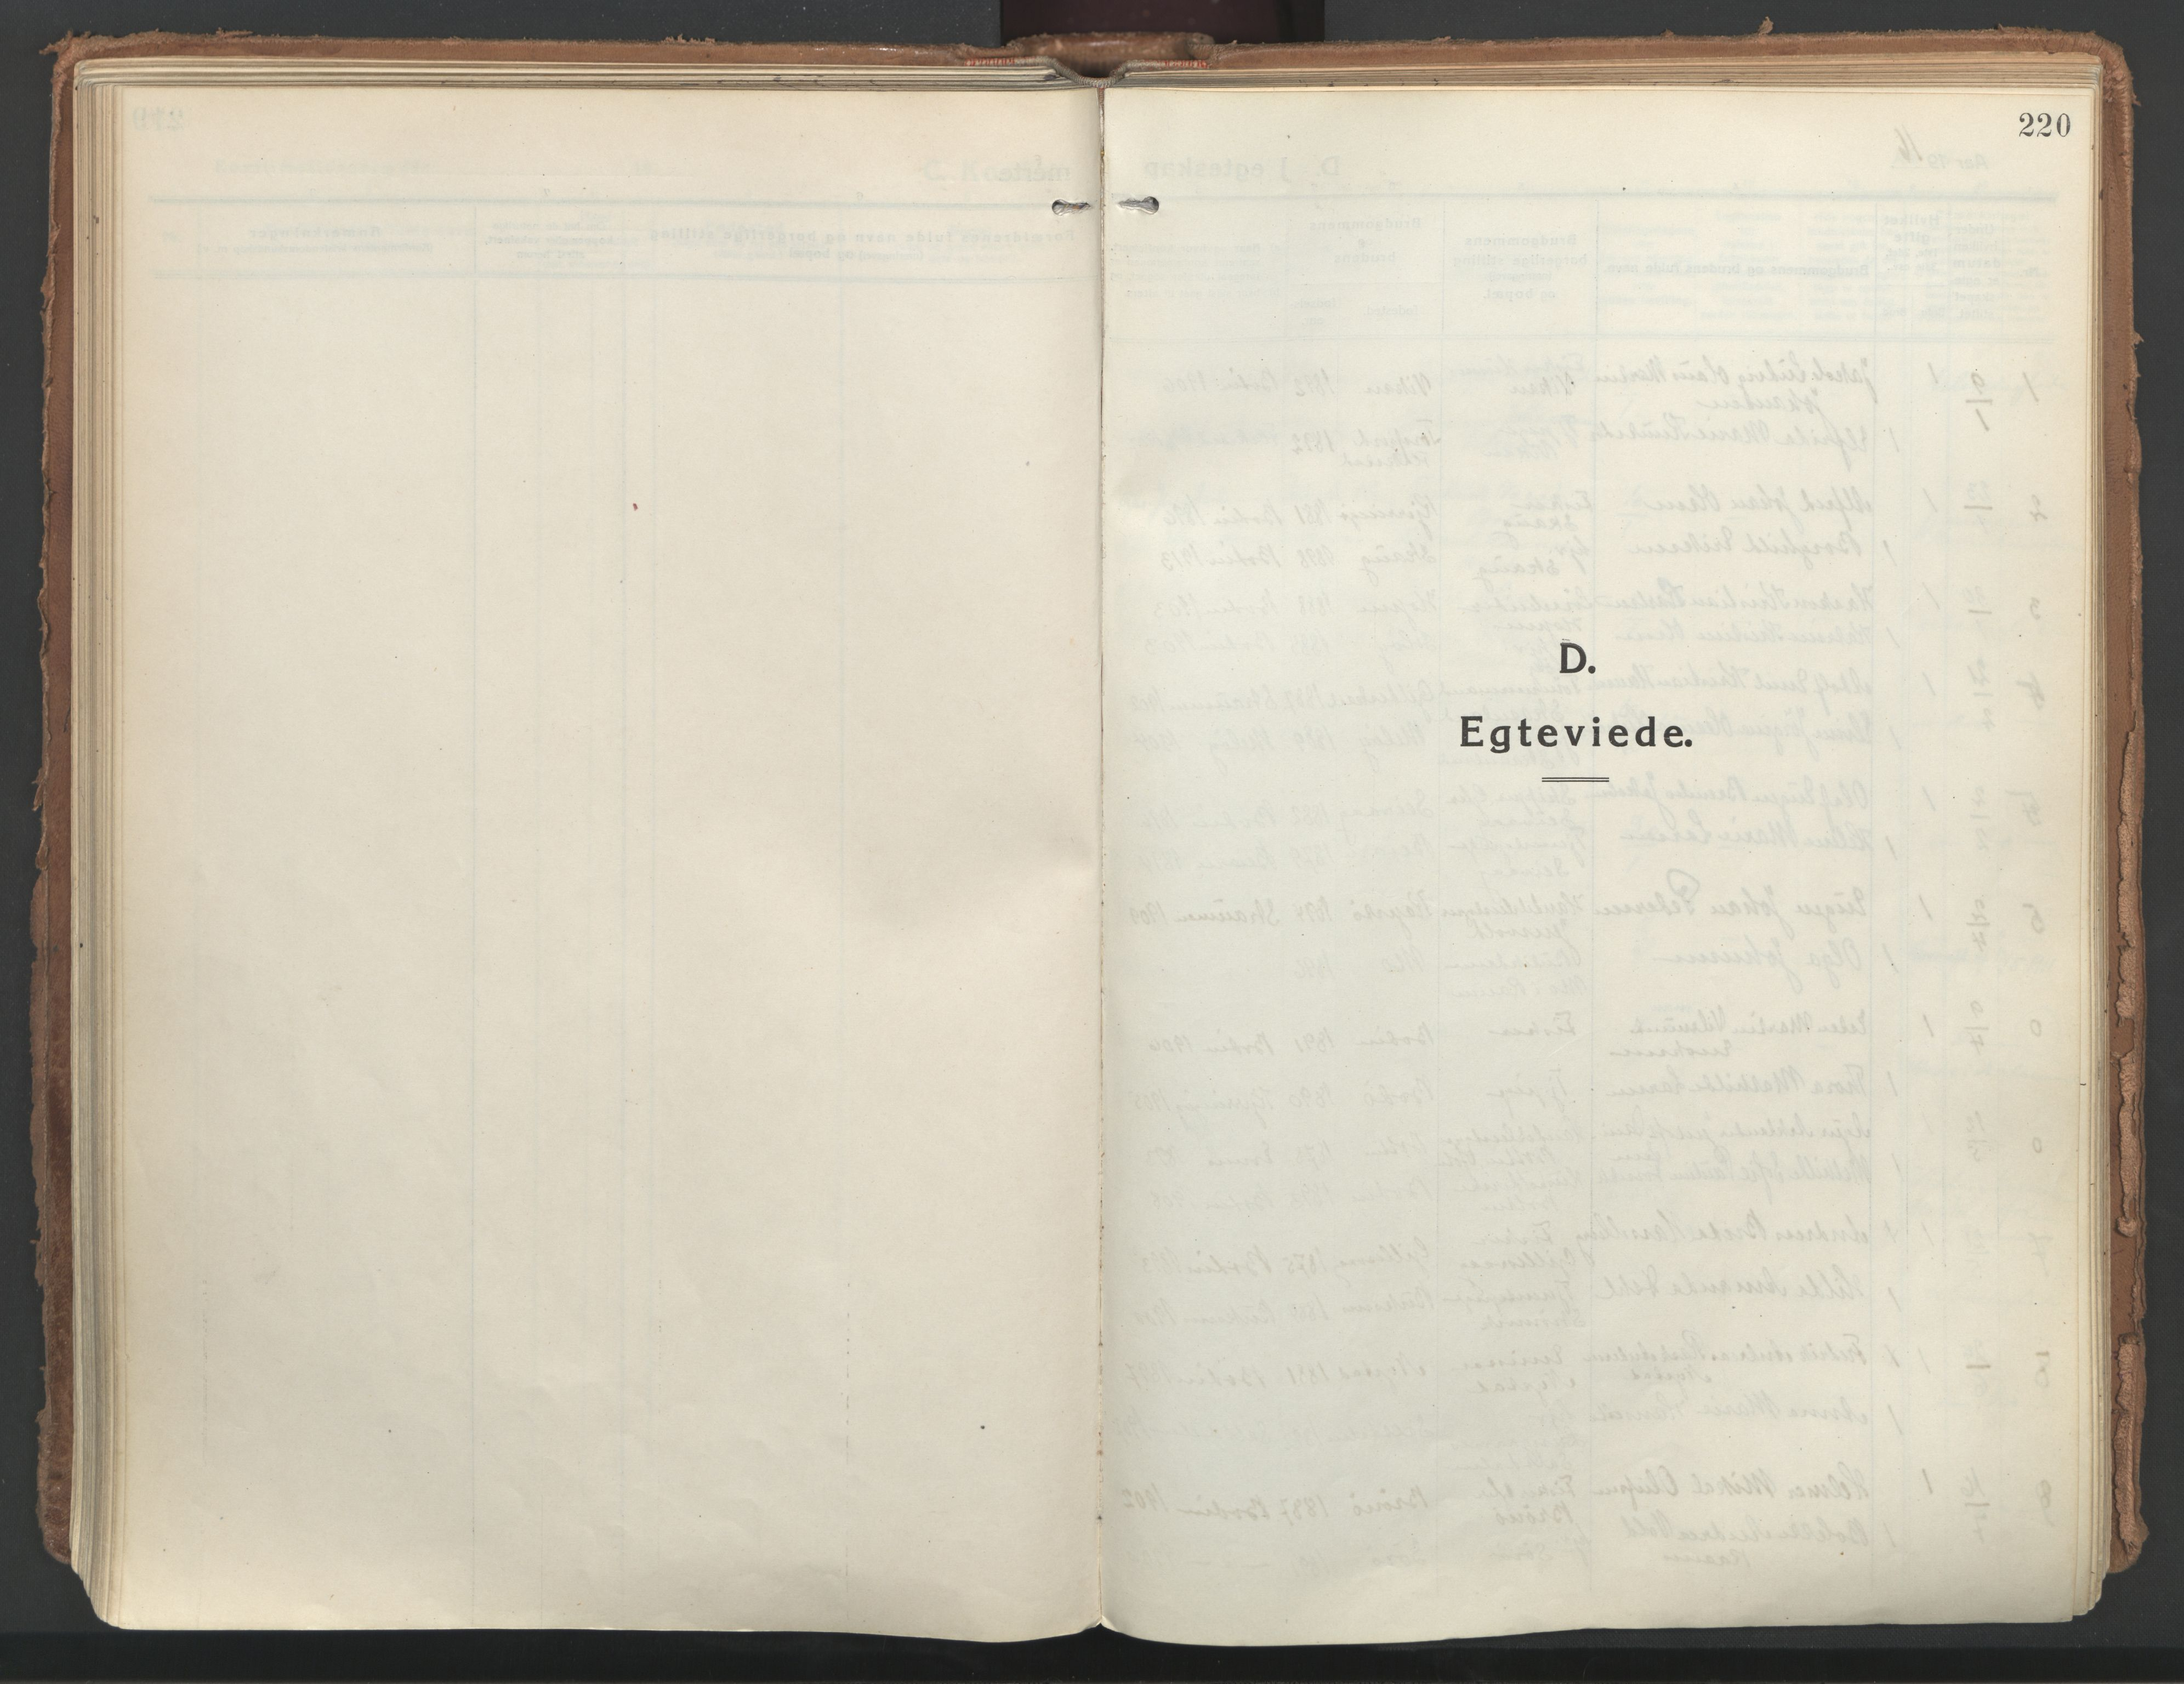 SAT, Ministerialprotokoller, klokkerbøker og fødselsregistre - Nordland, 802/L0060: Ministerialbok nr. 802A07, 1916-1933, s. 220